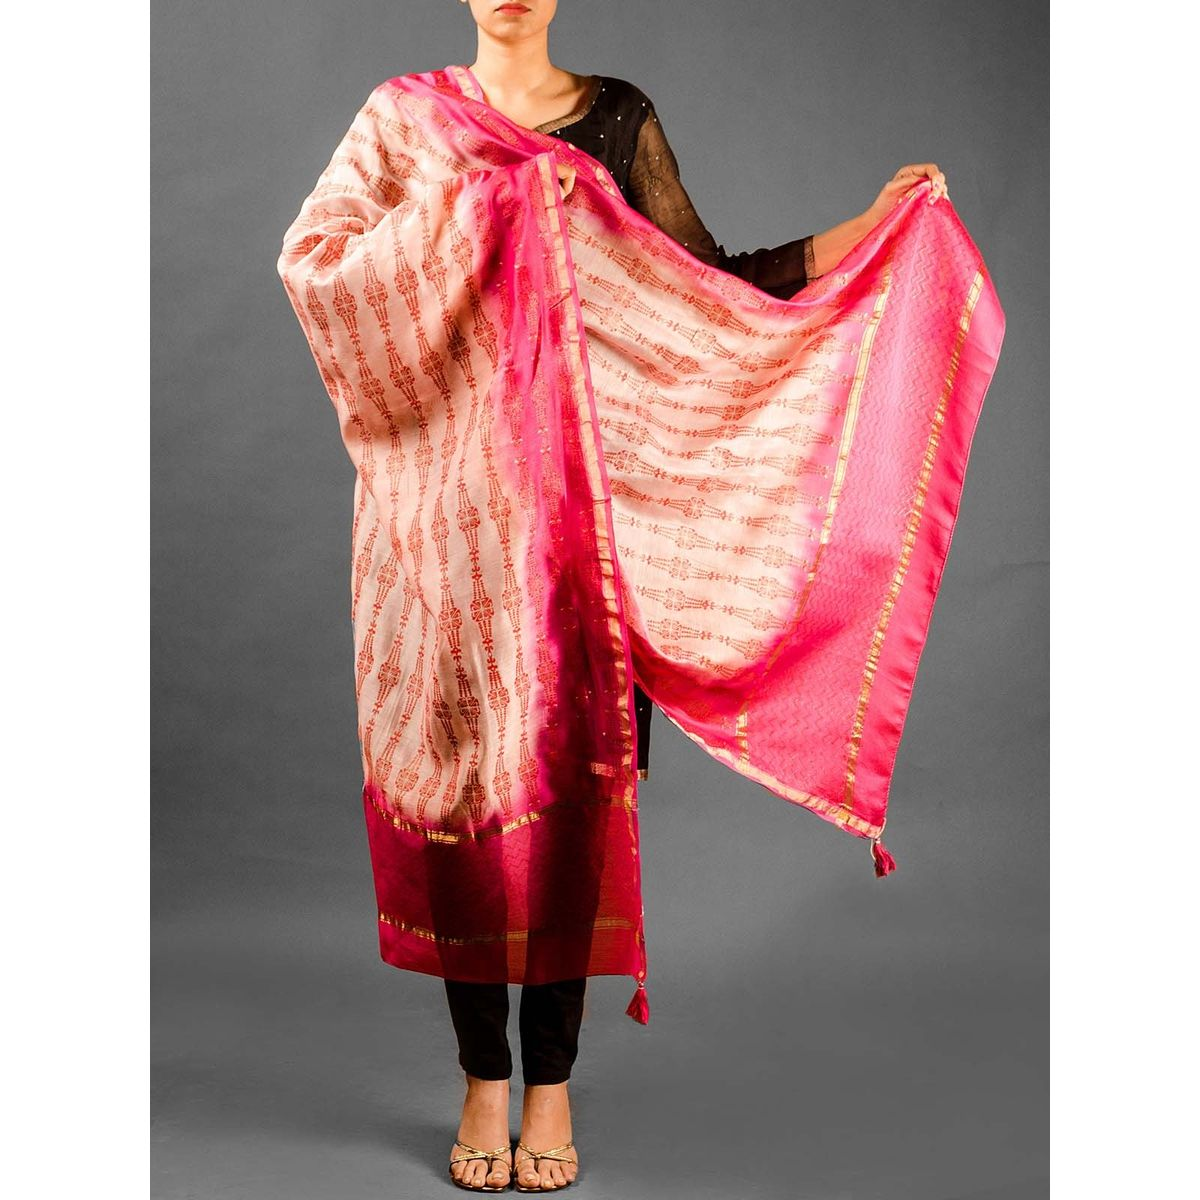 Zig-Zag Pattern Chanderi Duptta - Pink And  Light Pink